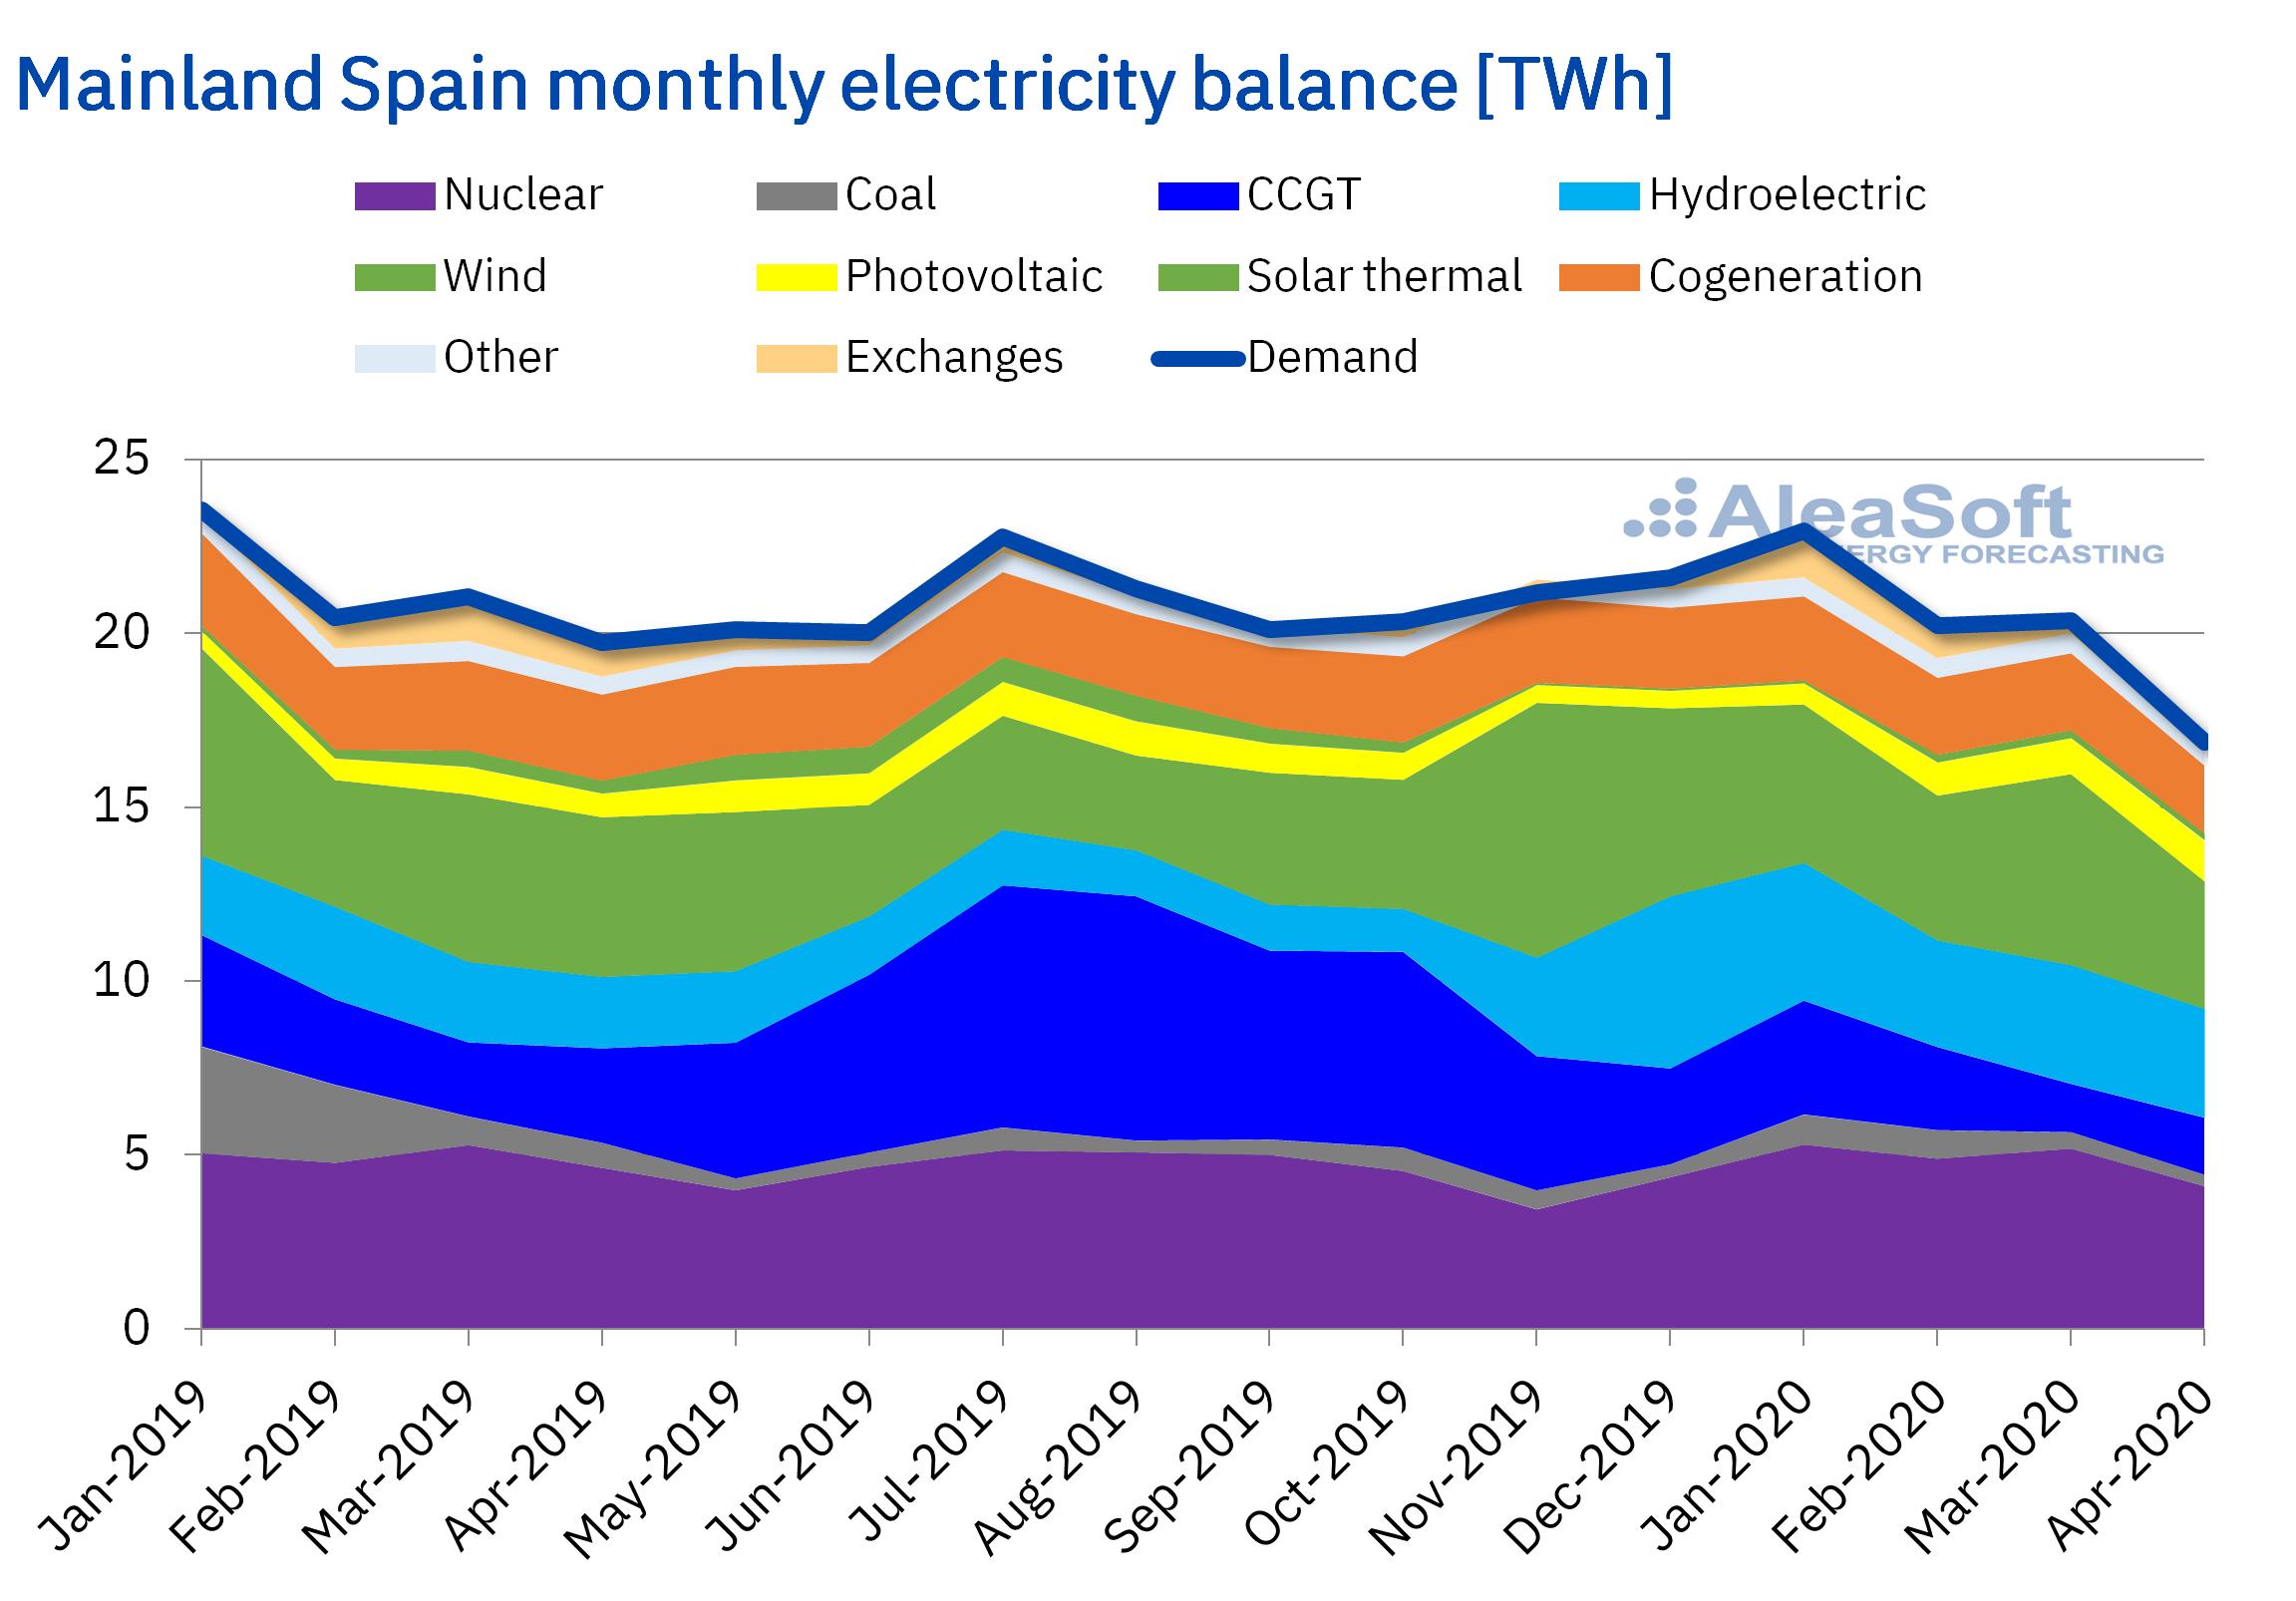 AleaSoft - Monthly electricity balance Spain demand production